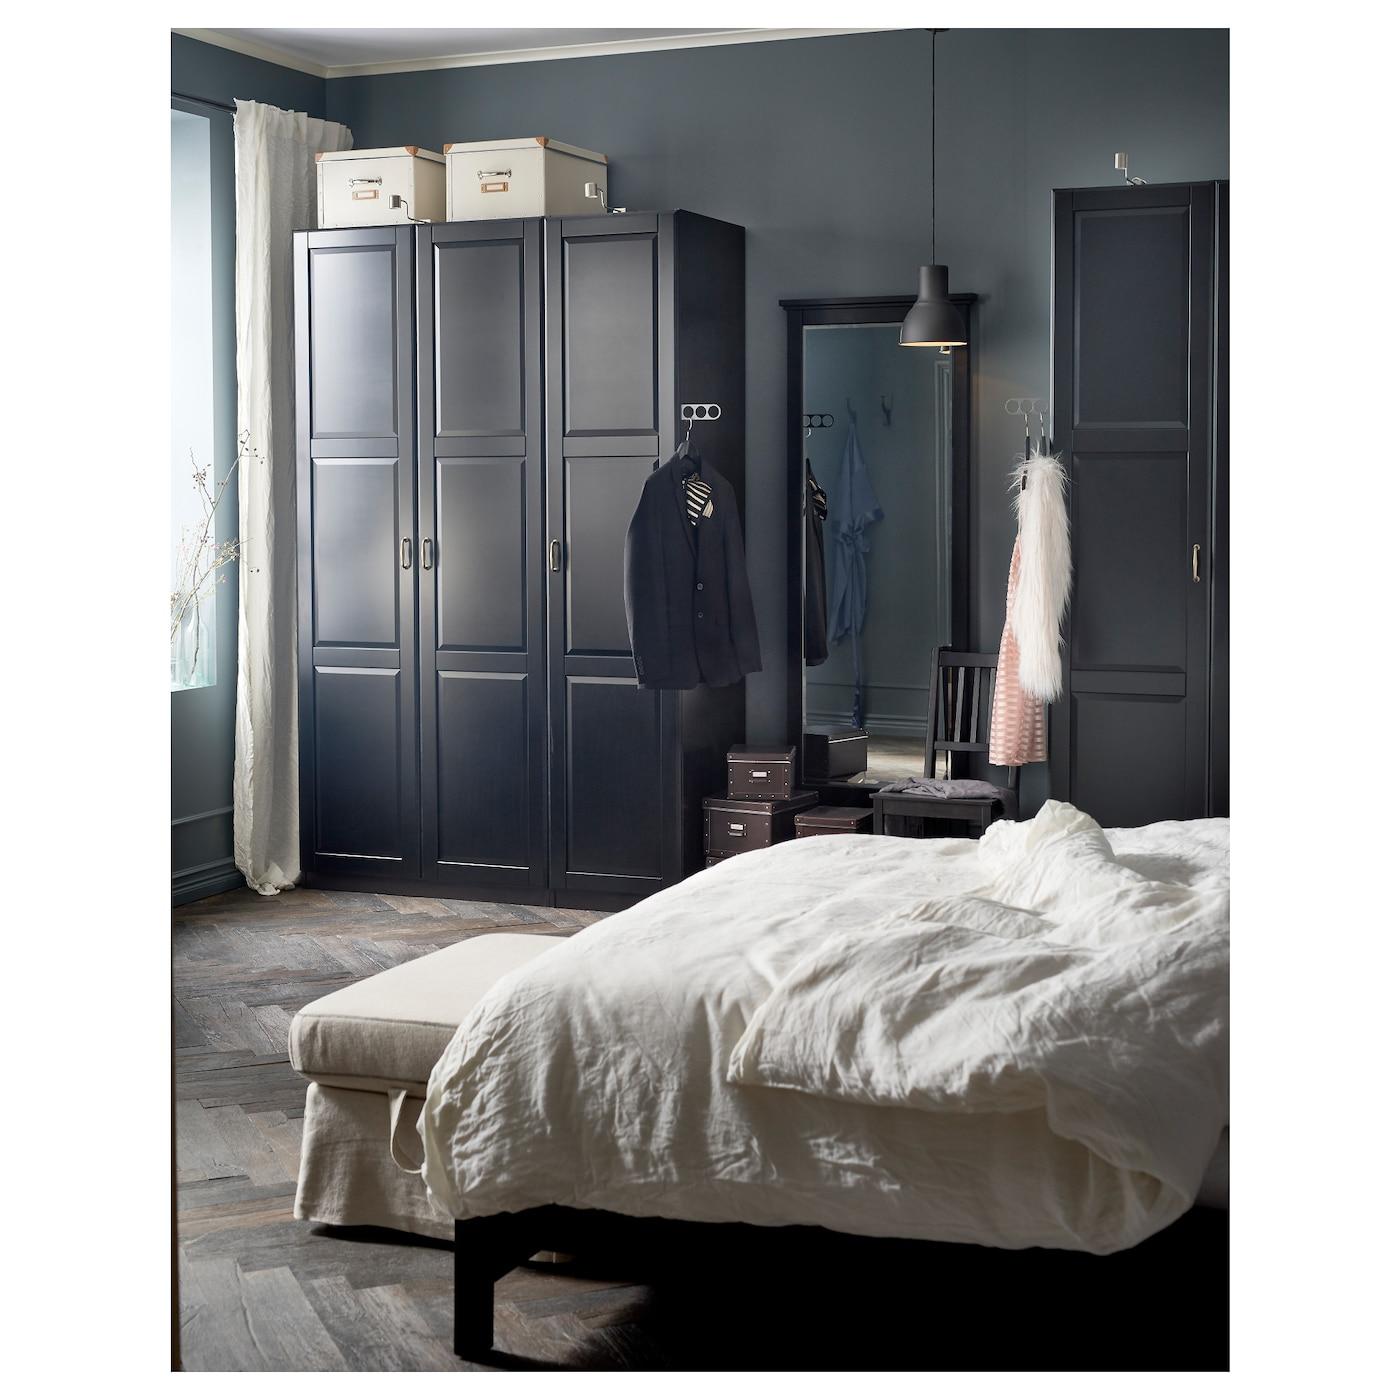 pax kledingkast zwartbruin undredal zwart 150 x 60 x 236 cm ikea. Black Bedroom Furniture Sets. Home Design Ideas